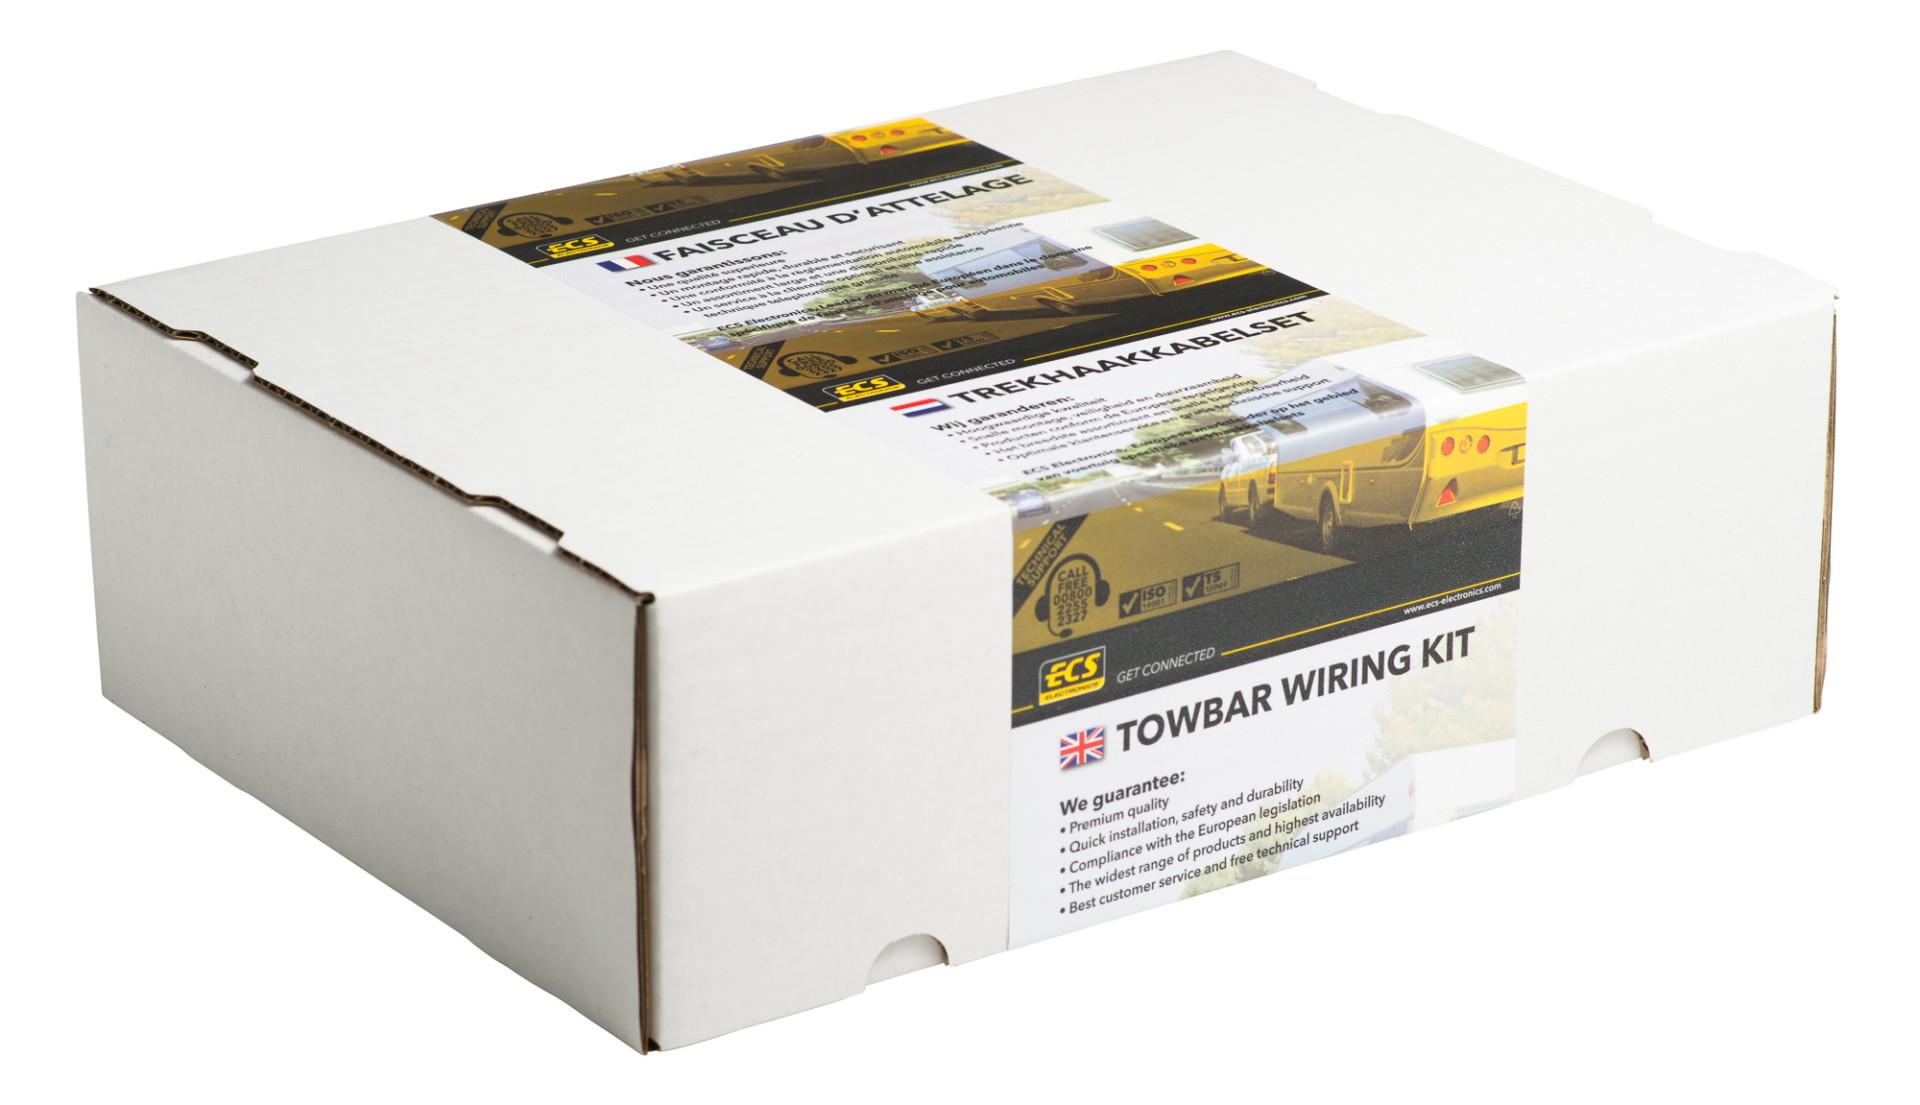 Towbar-wiring-kit-e-commerce-0035d5-1